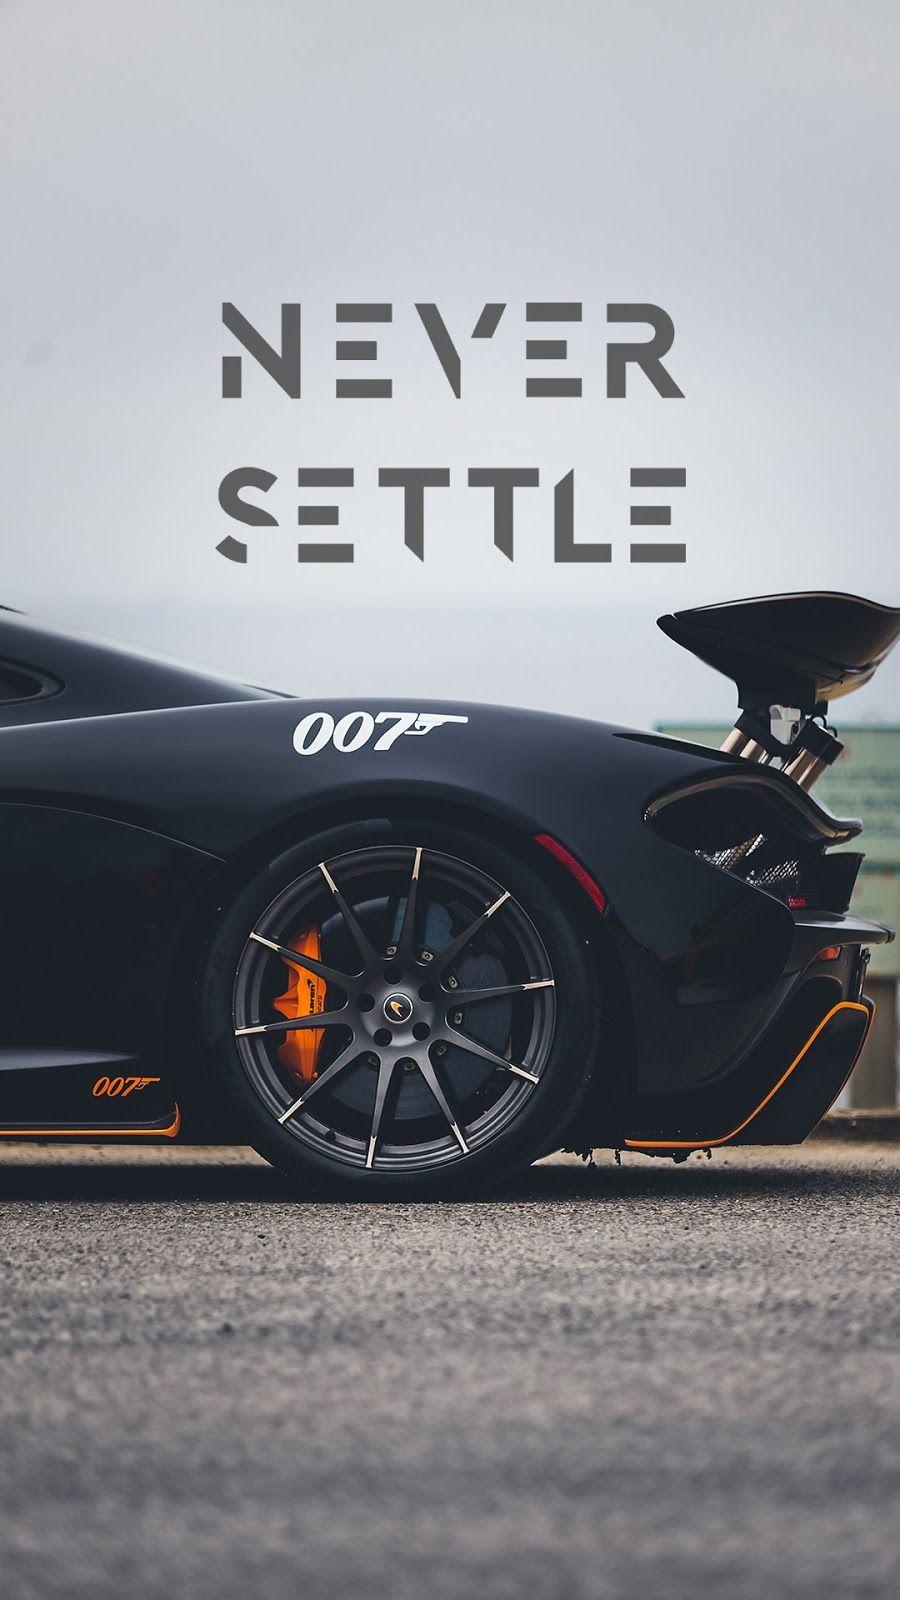 Never Settle Car Wallpaper Car Wallpapers Sports Car Wallpaper Never Settle Wallpapers